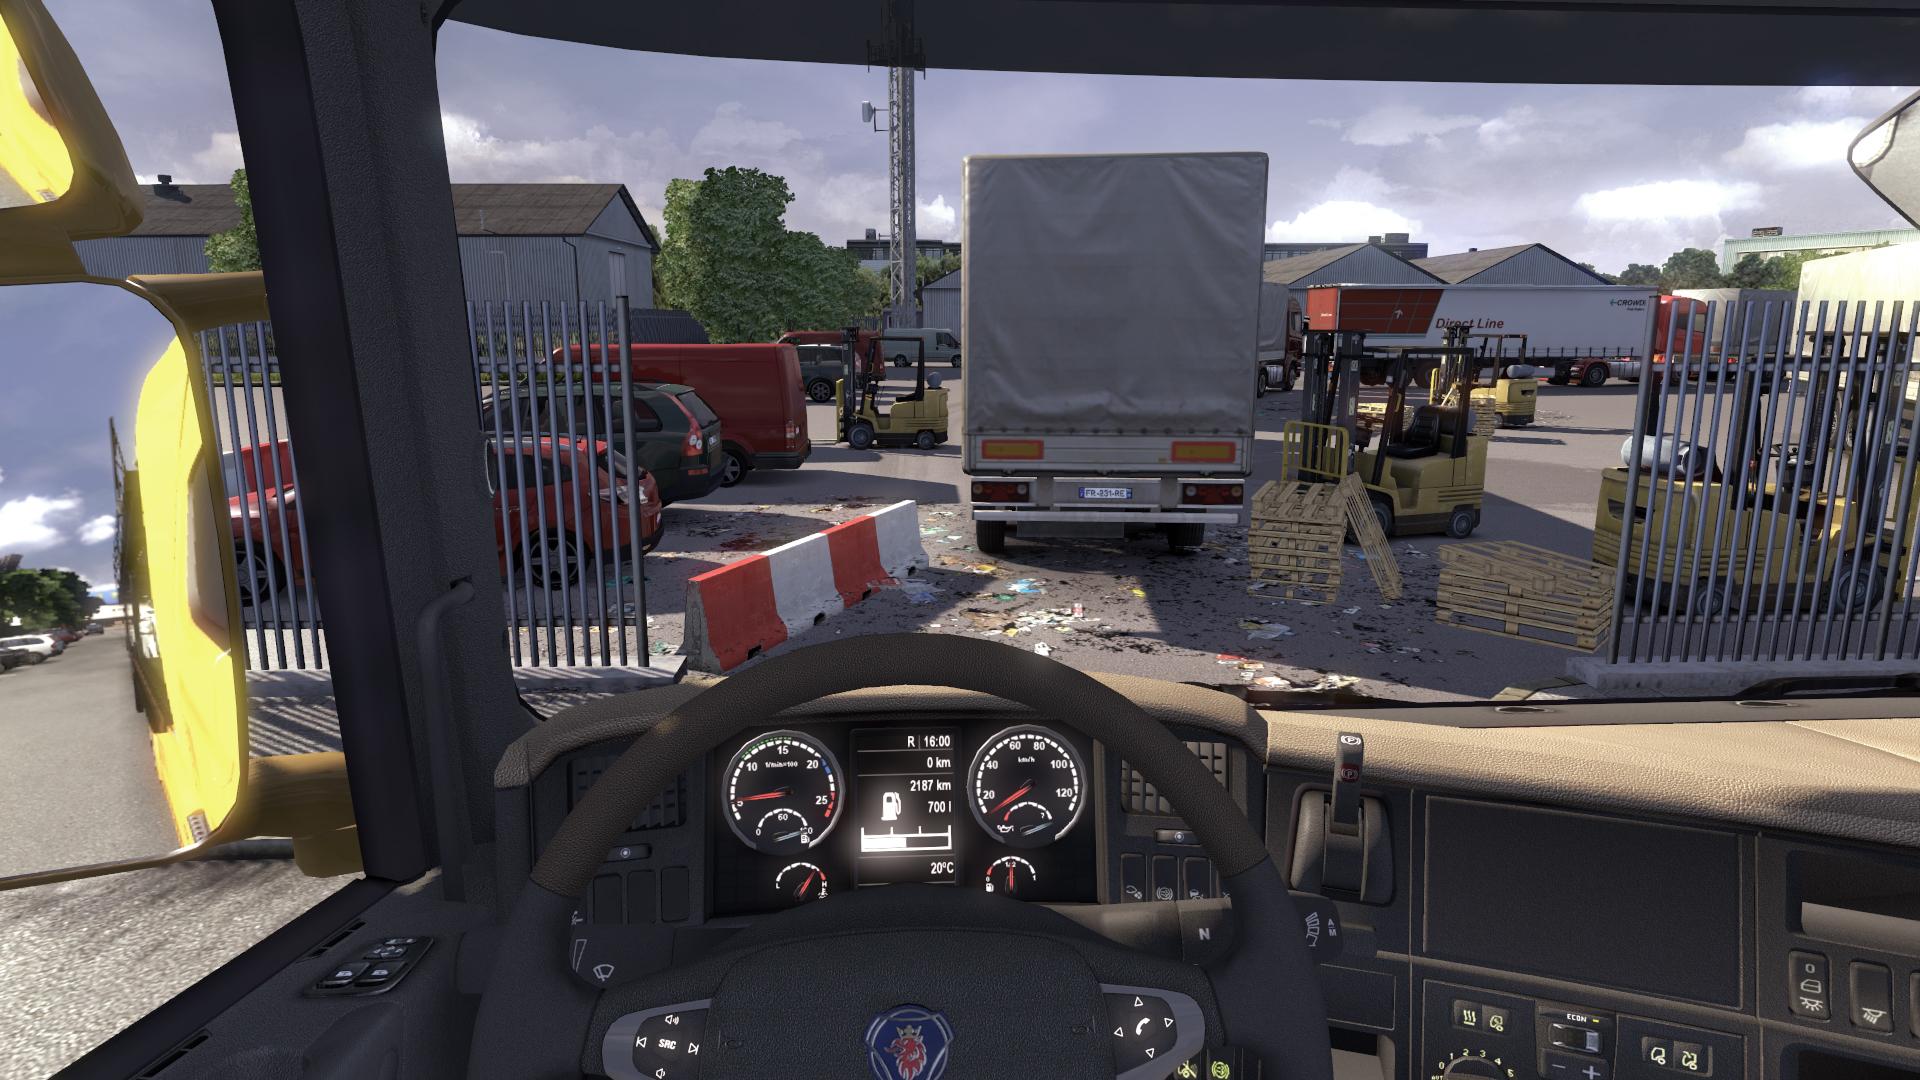 download scania truck driving simulator full pc game. Black Bedroom Furniture Sets. Home Design Ideas